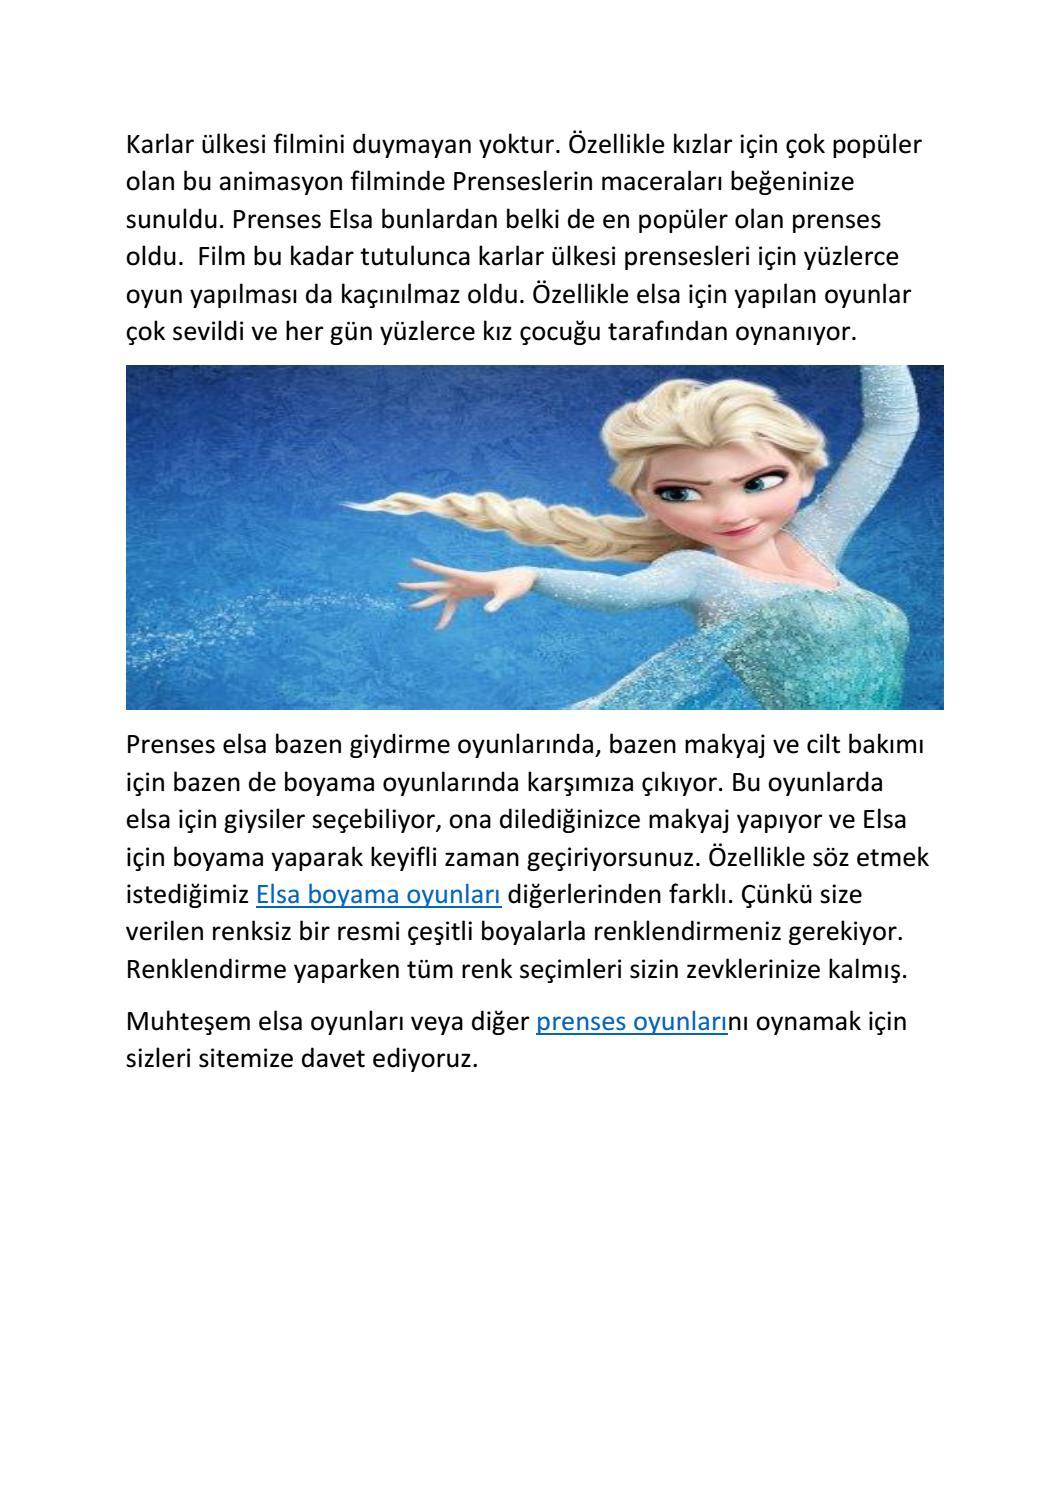 Prenses Elsa Boyama Oyunları By Secilarslann Issuu